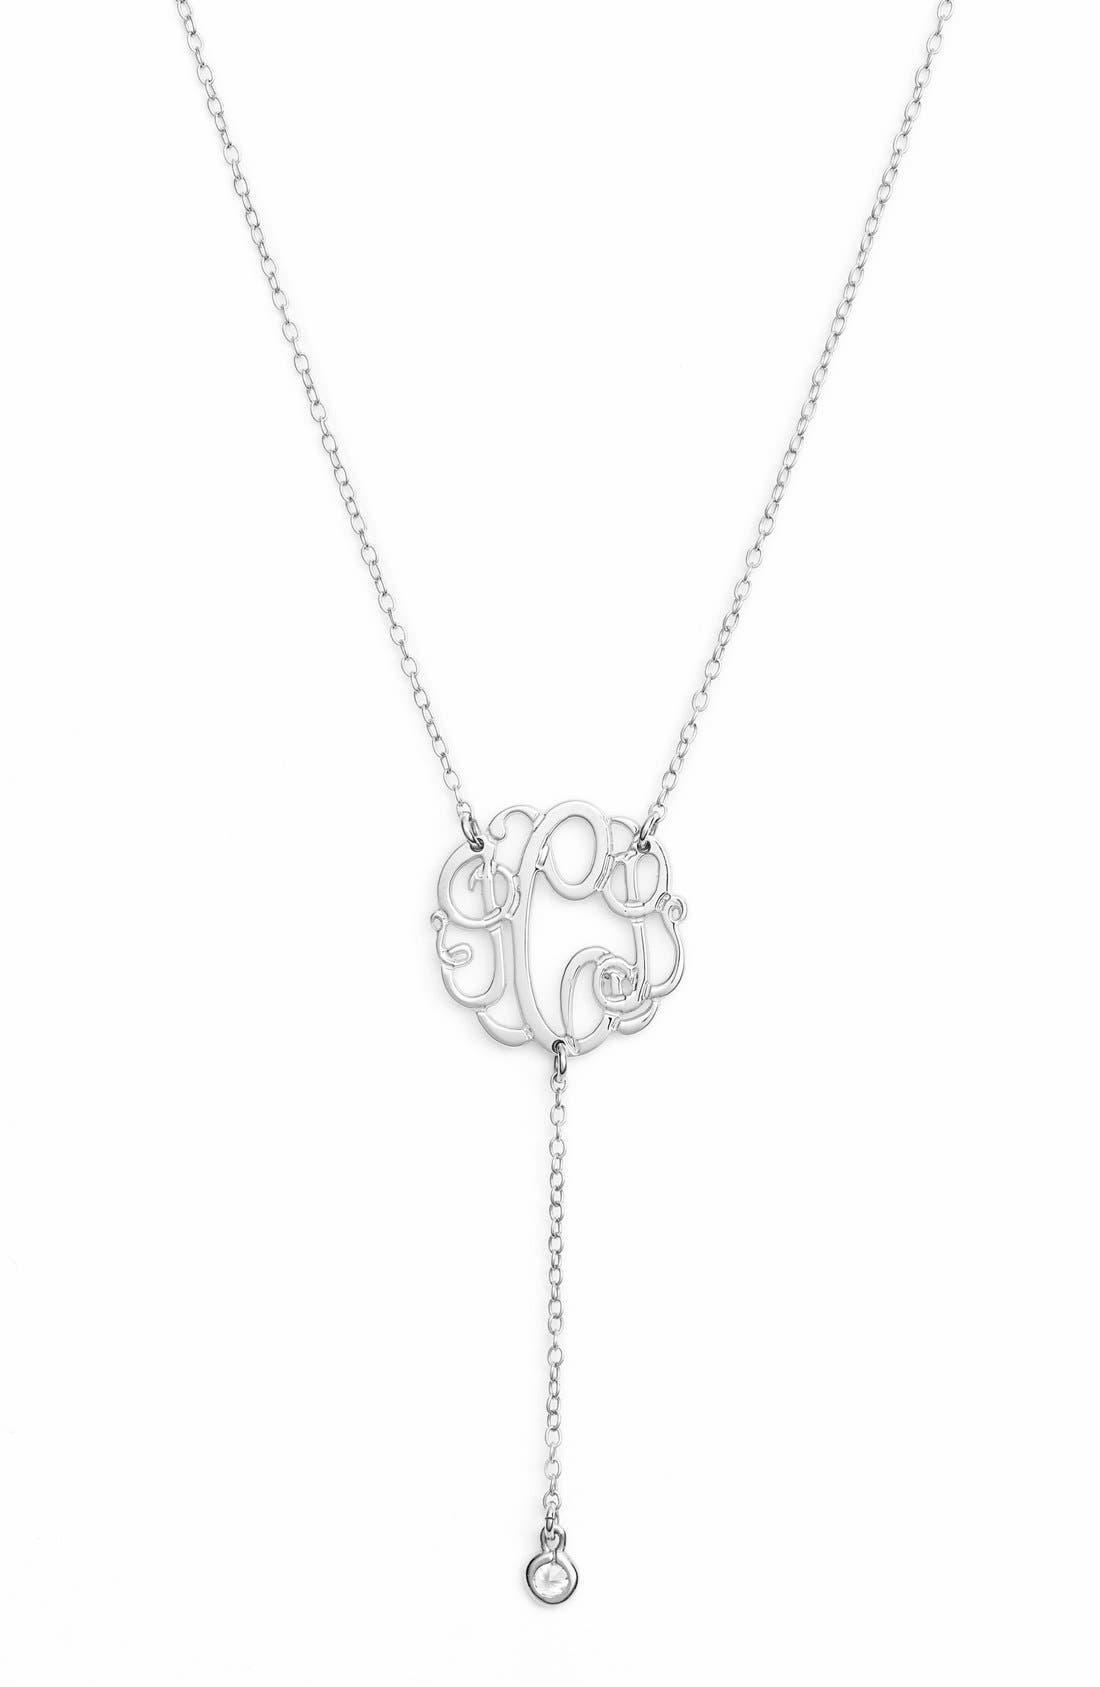 Argento Vivo Personalized Three Initial Y-Necklace